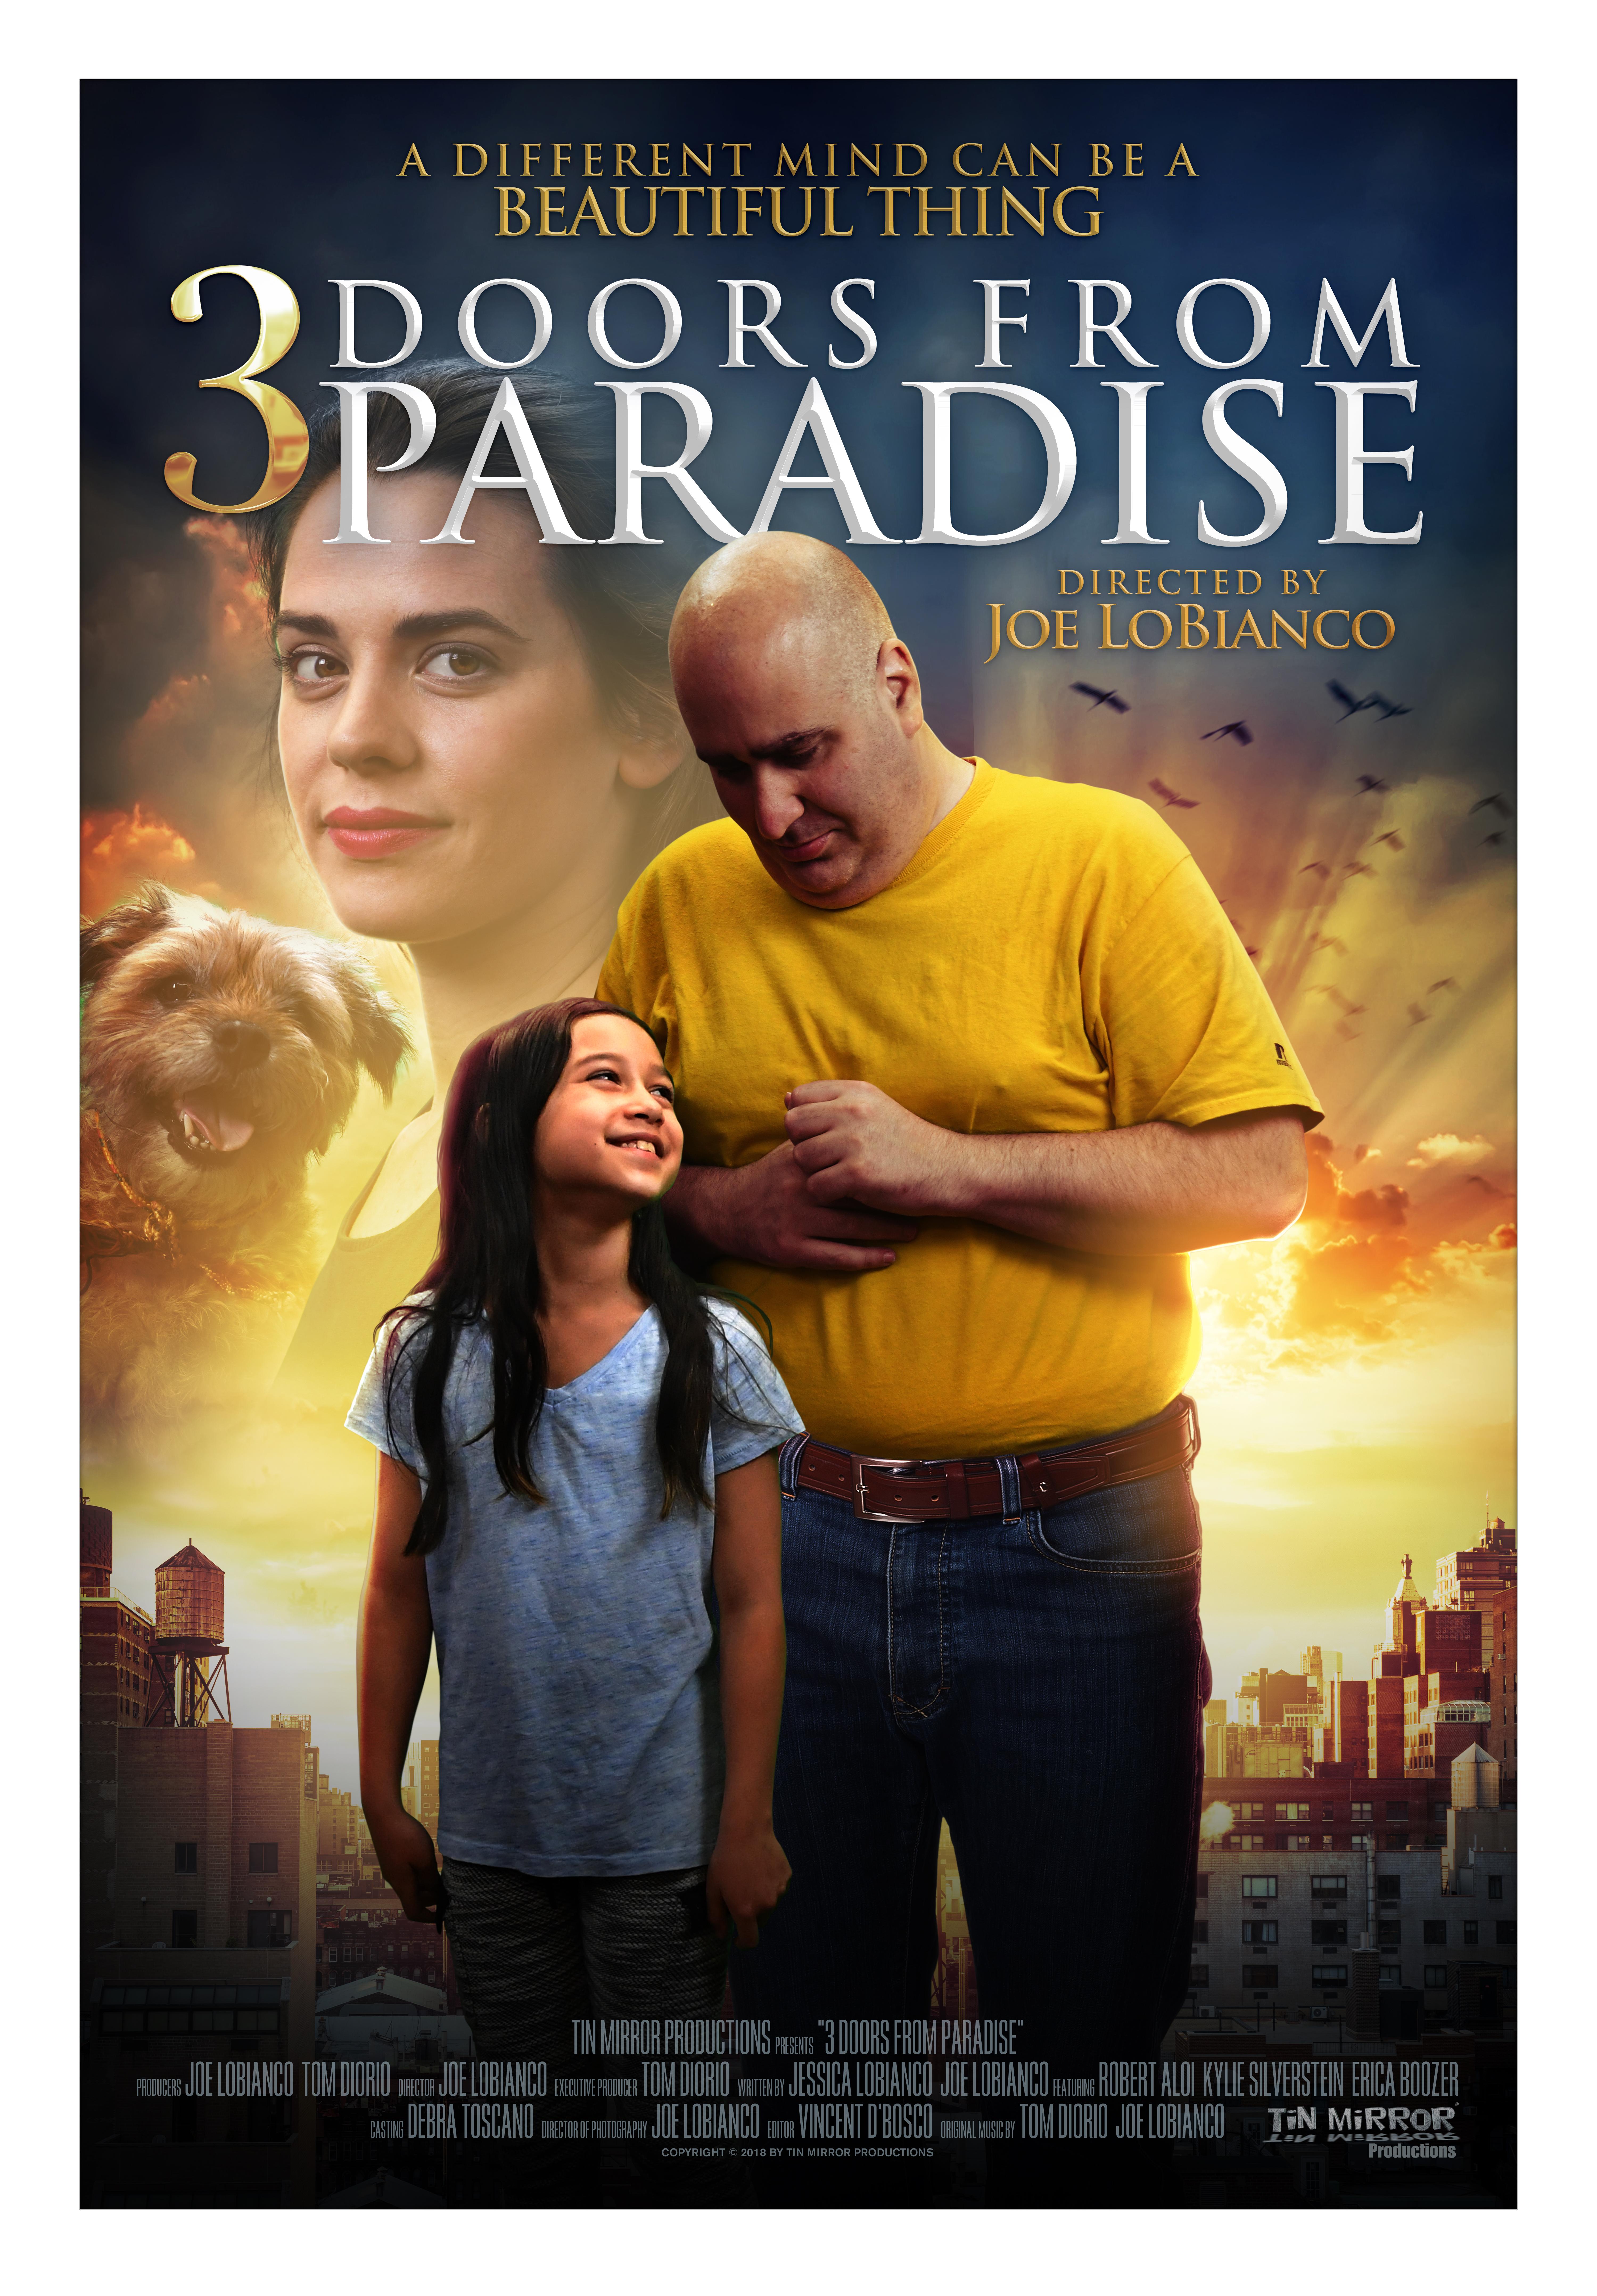 sc 1 st  IMDb & 3 Doors From Paradise (2018) - IMDb